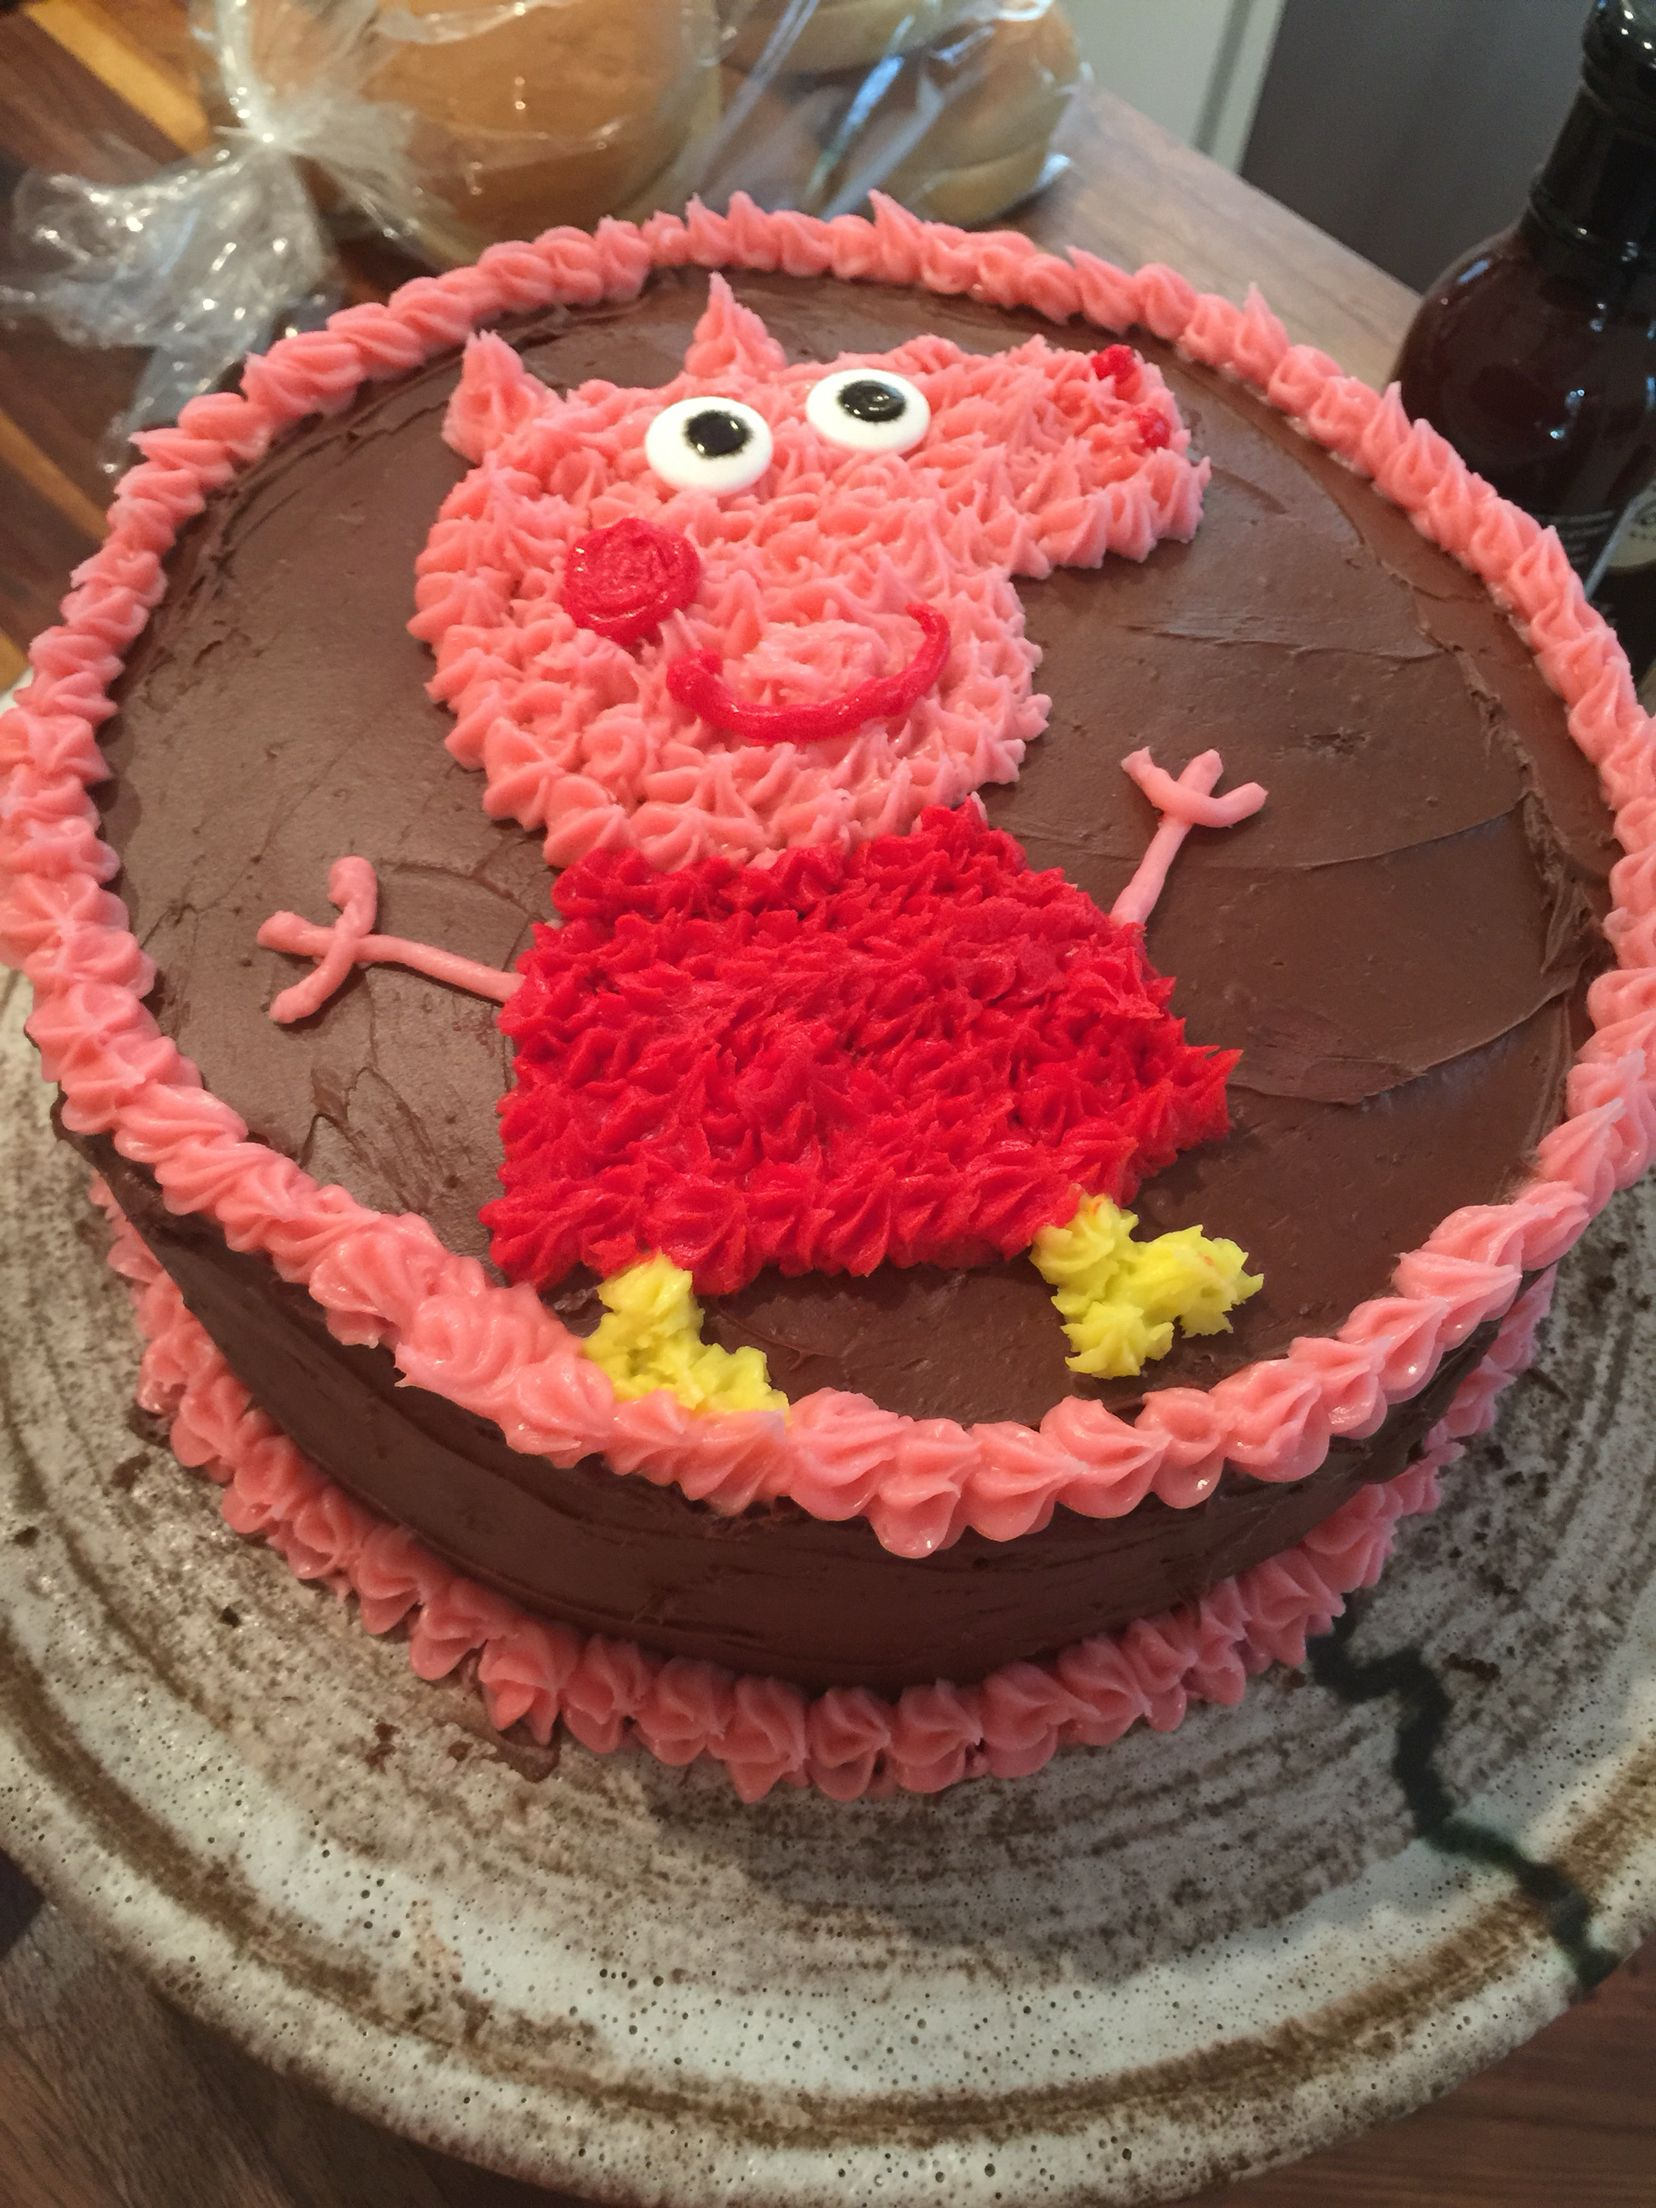 Homemade Peppa Pig Cake Pig Birthday Cakes Peppa Pig Birthday